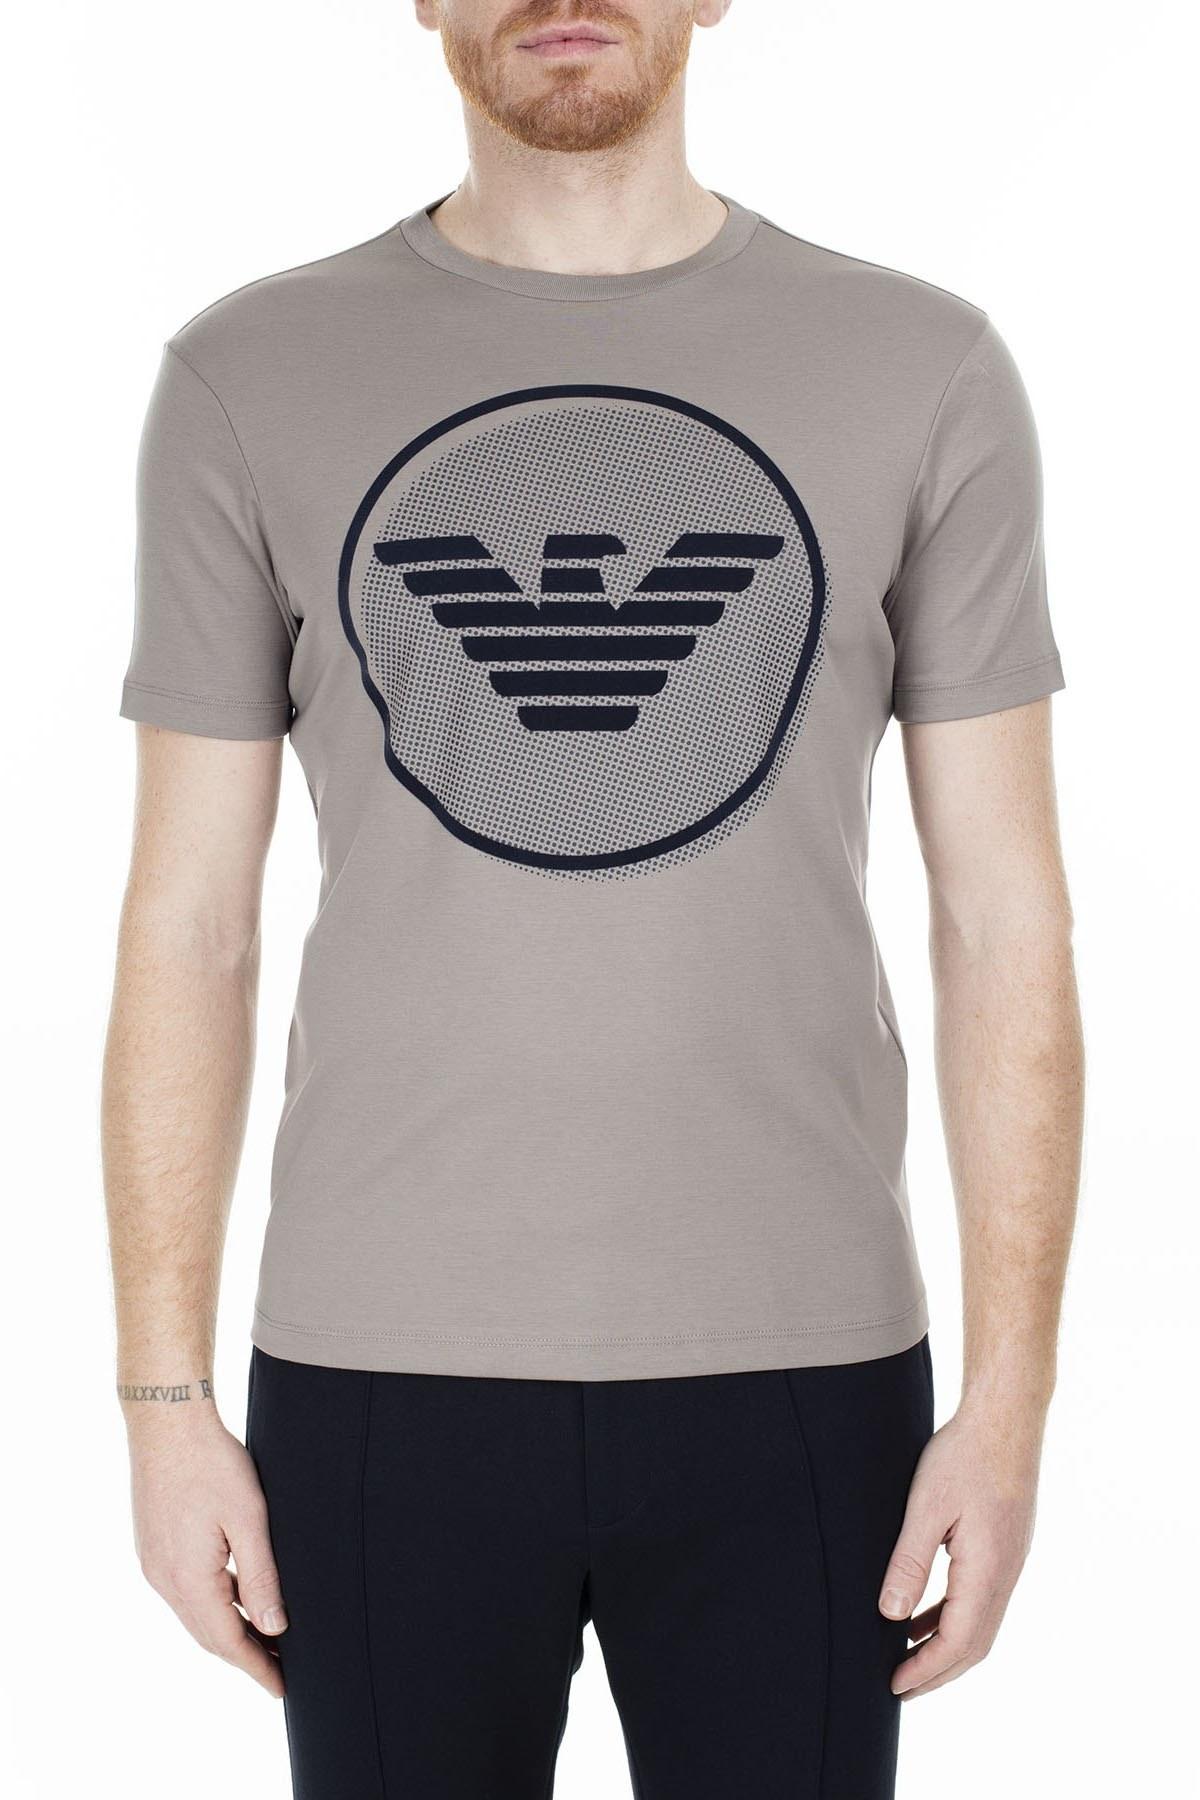 Emporio Armani Erkek T Shirt S 6G1TF5 1JPRZ 0654 VİZON